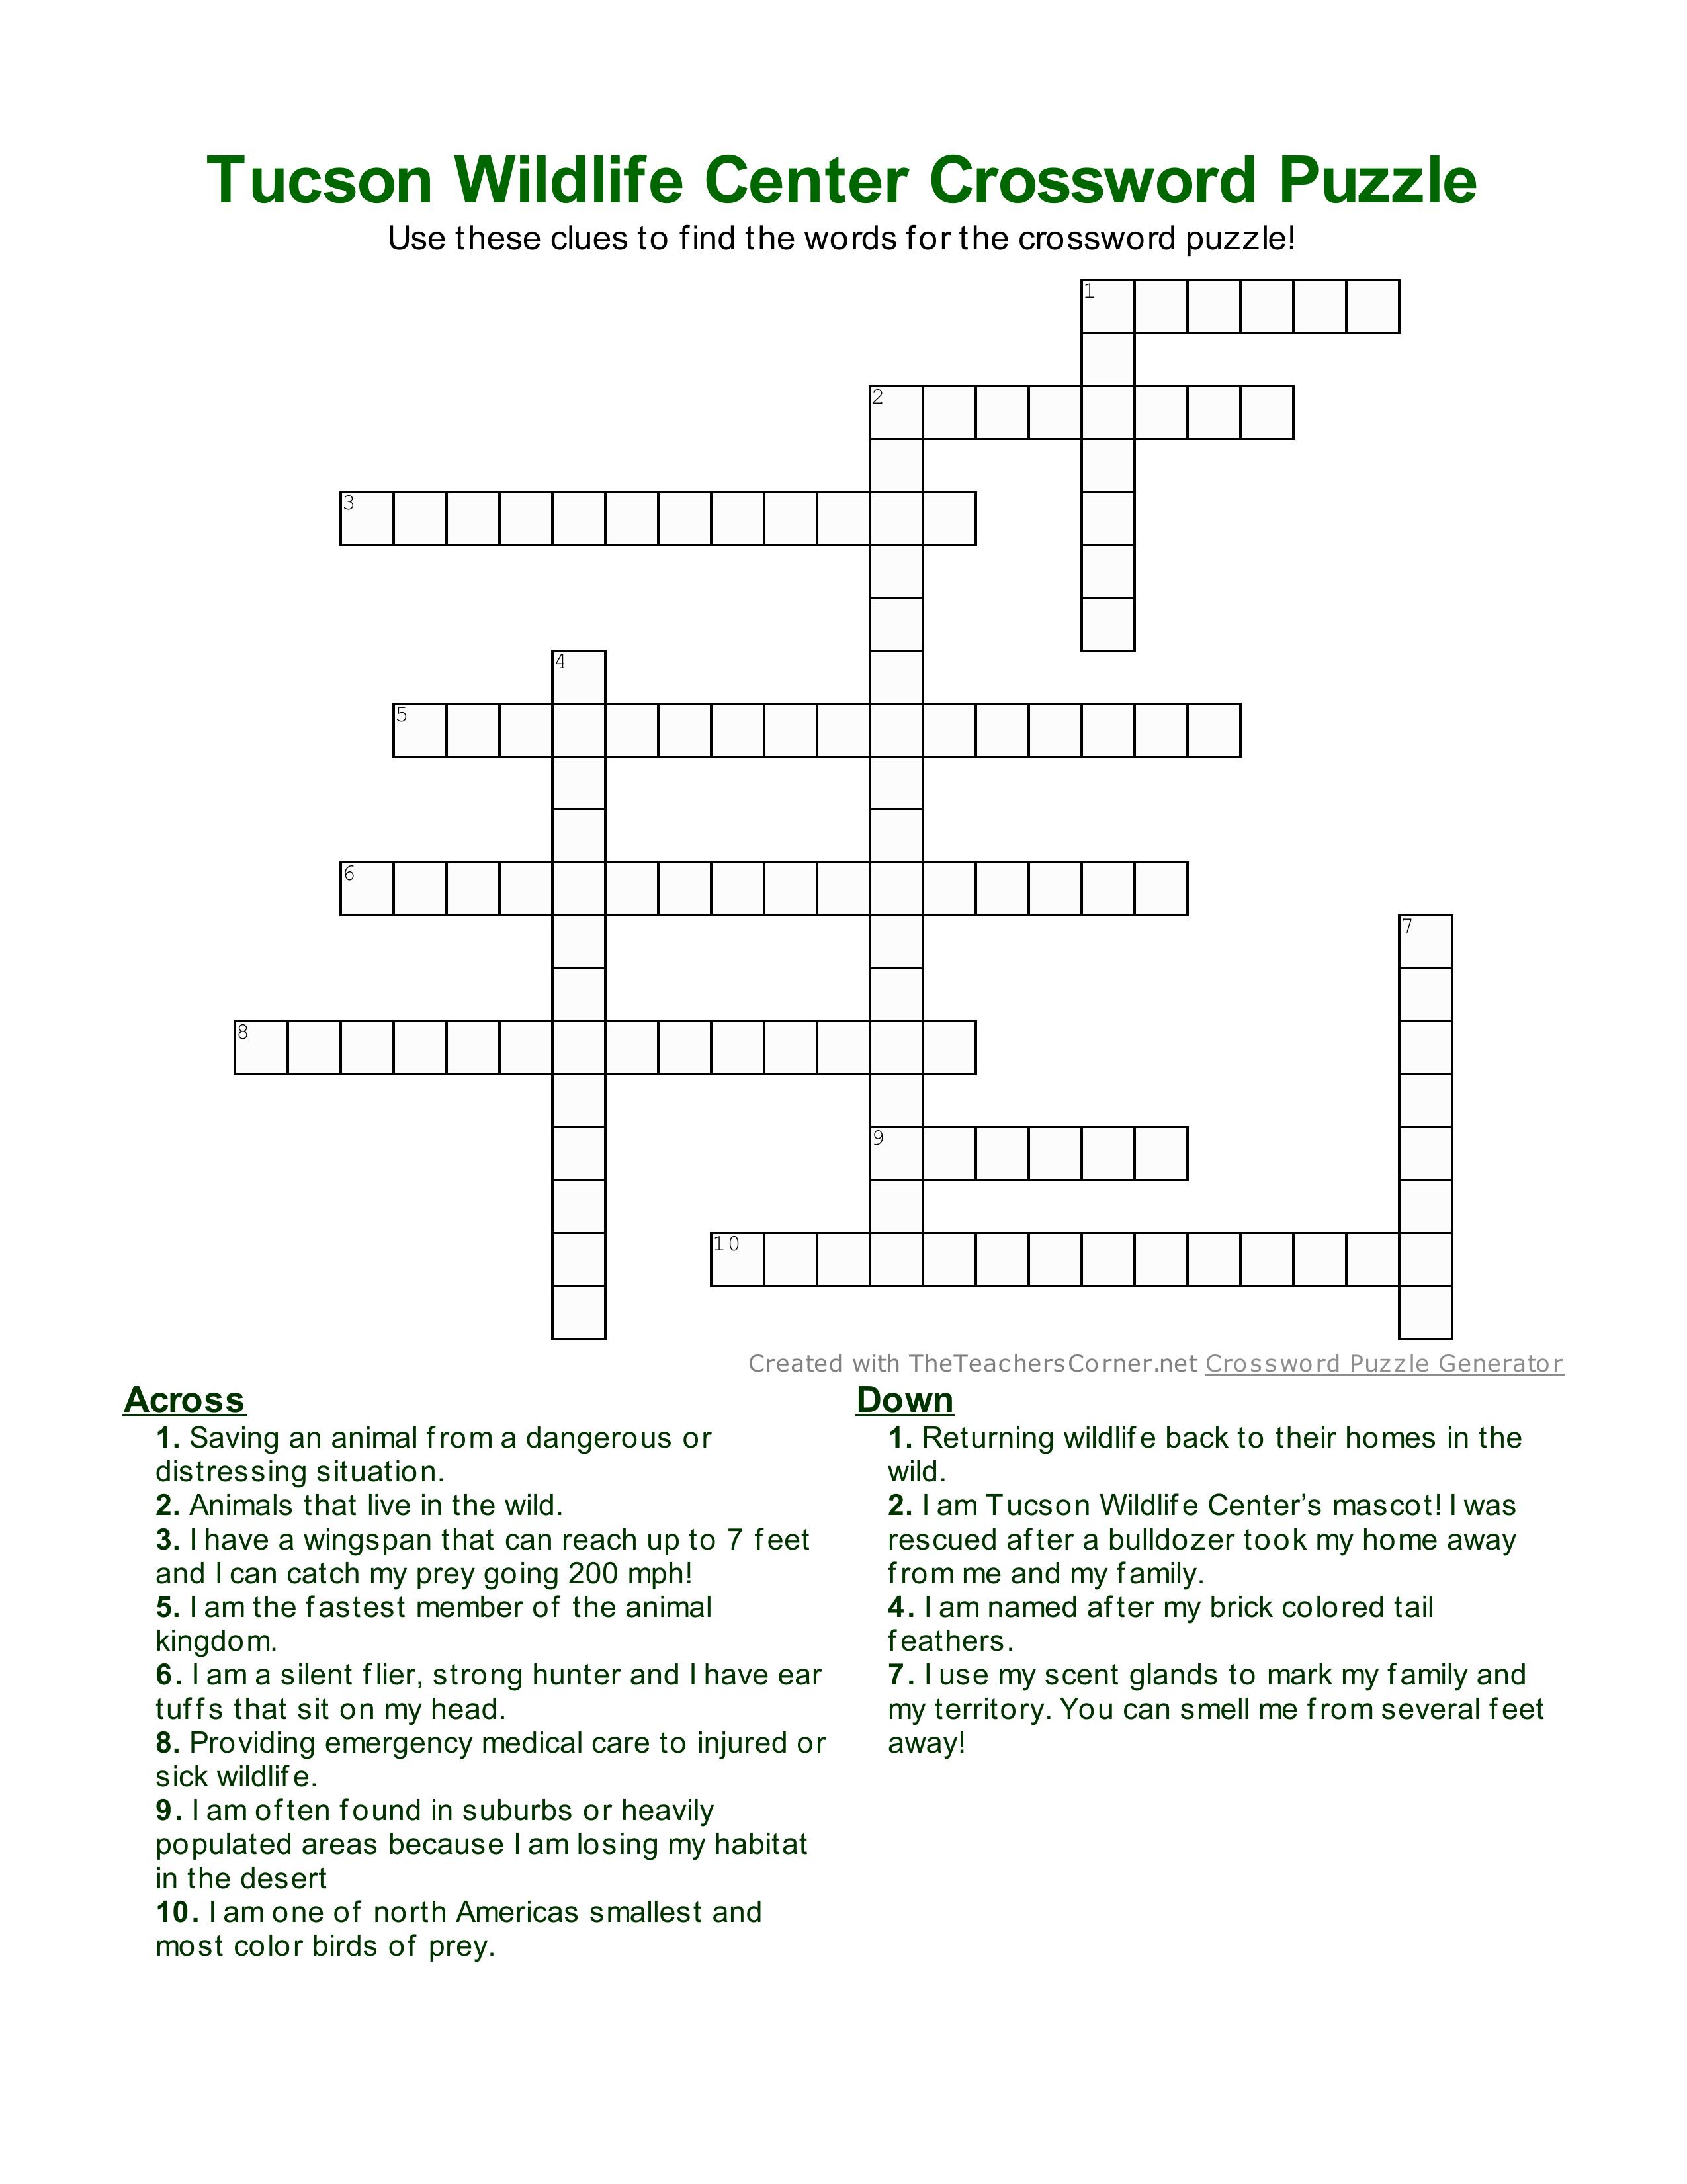 tucson-wildlife-crossword-puzzle